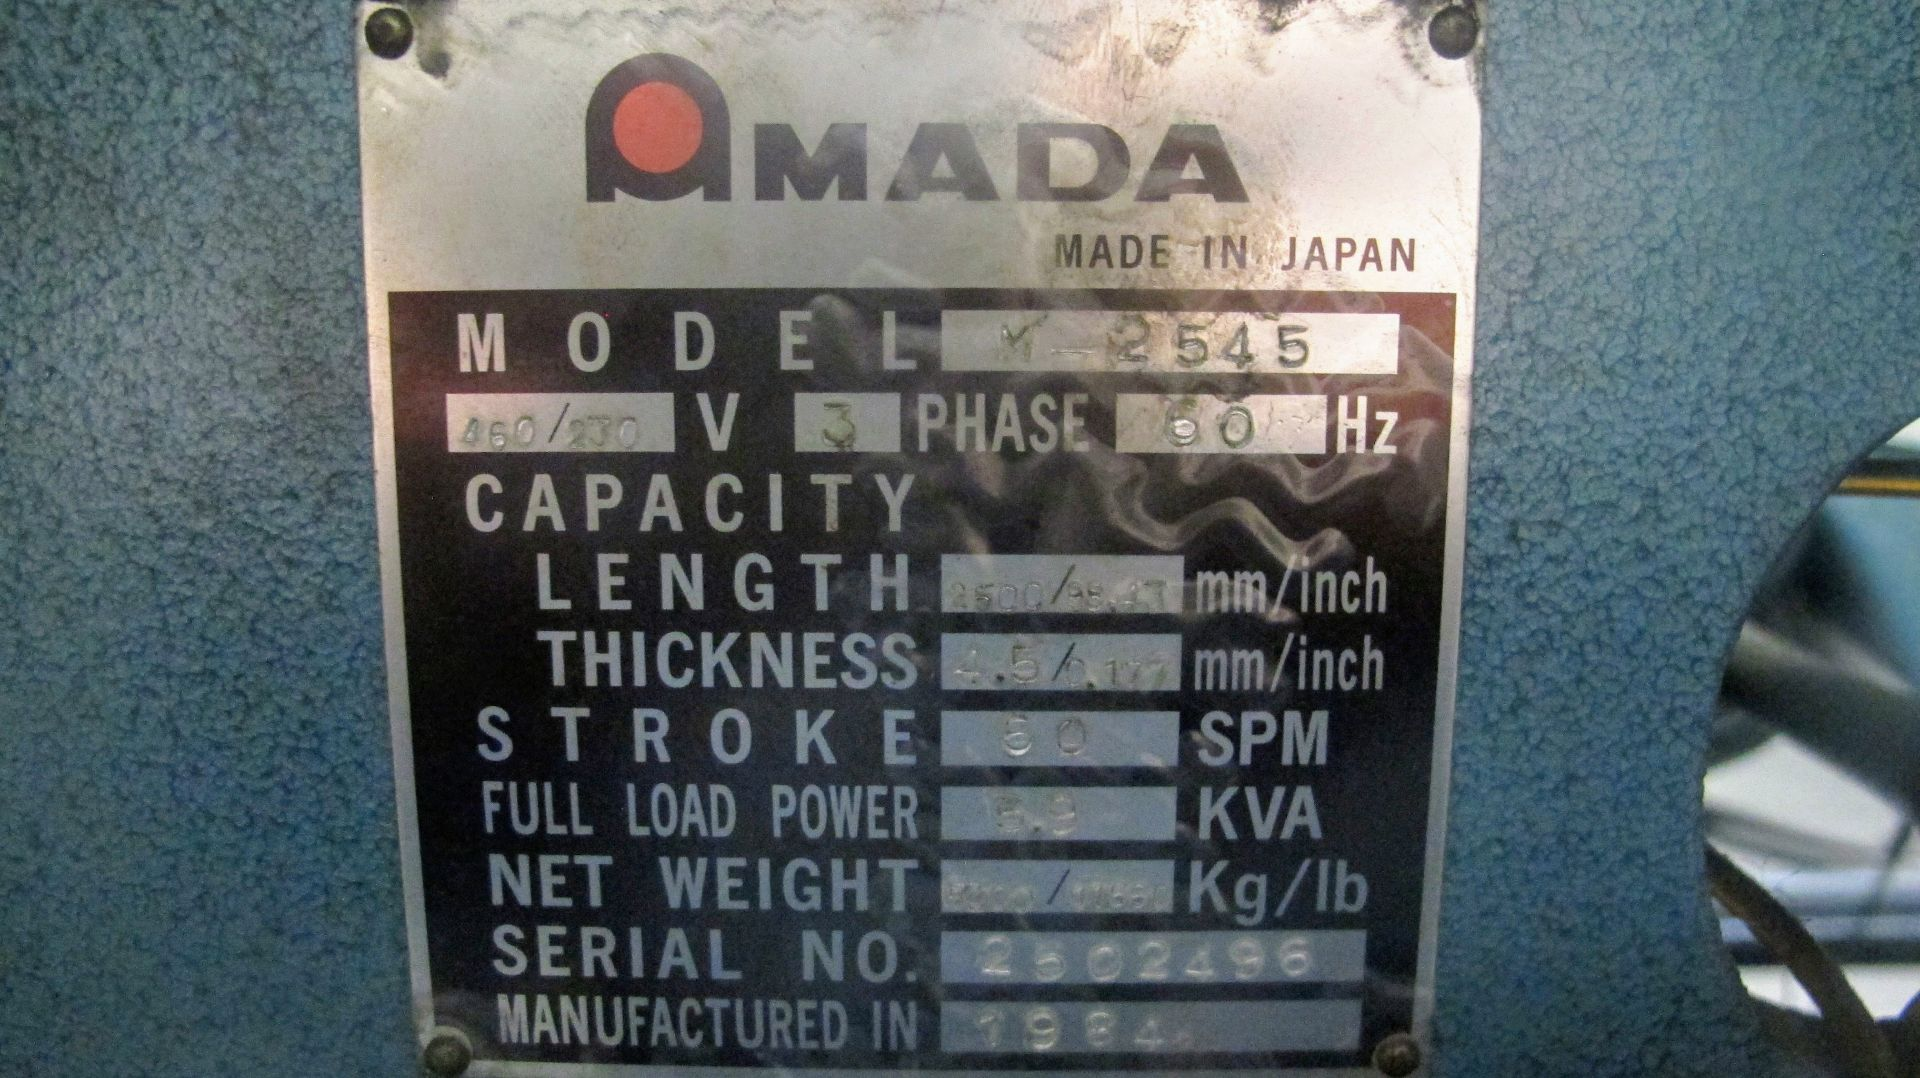 "Lot 11 - AMADA M-2545 POWER SHEAR, 3/16"" X 96"" CAP., 60 SPM, S/N 2502496, 3 PHASE, 5.9KVA FULL LOAD"